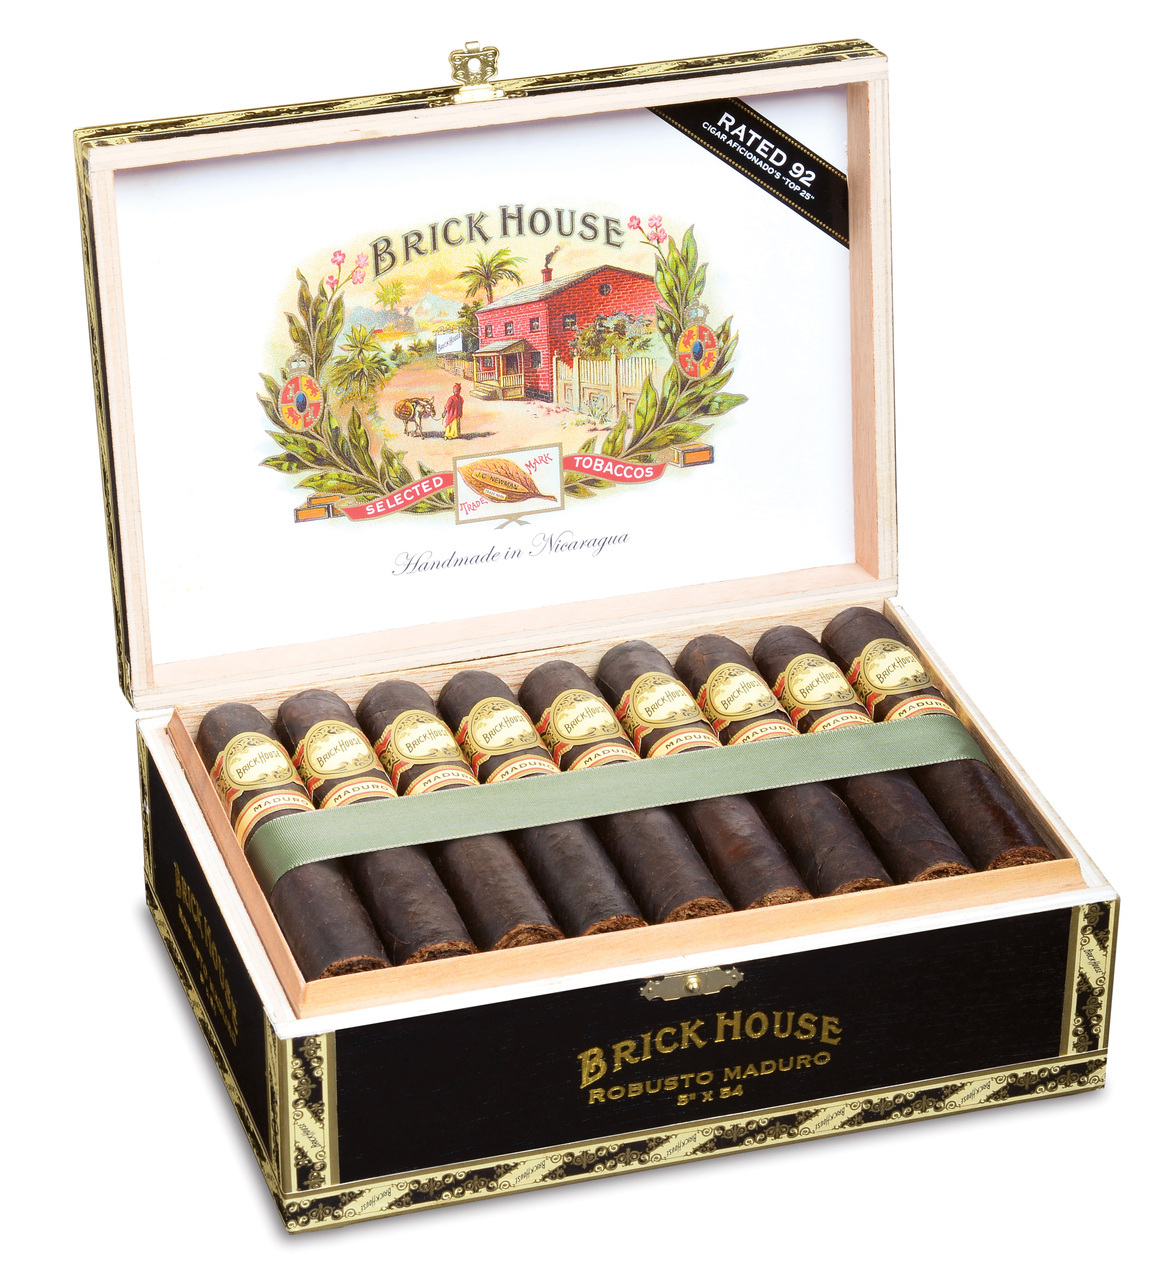 Brick House Robusto Cigars - Maduro Box of 25